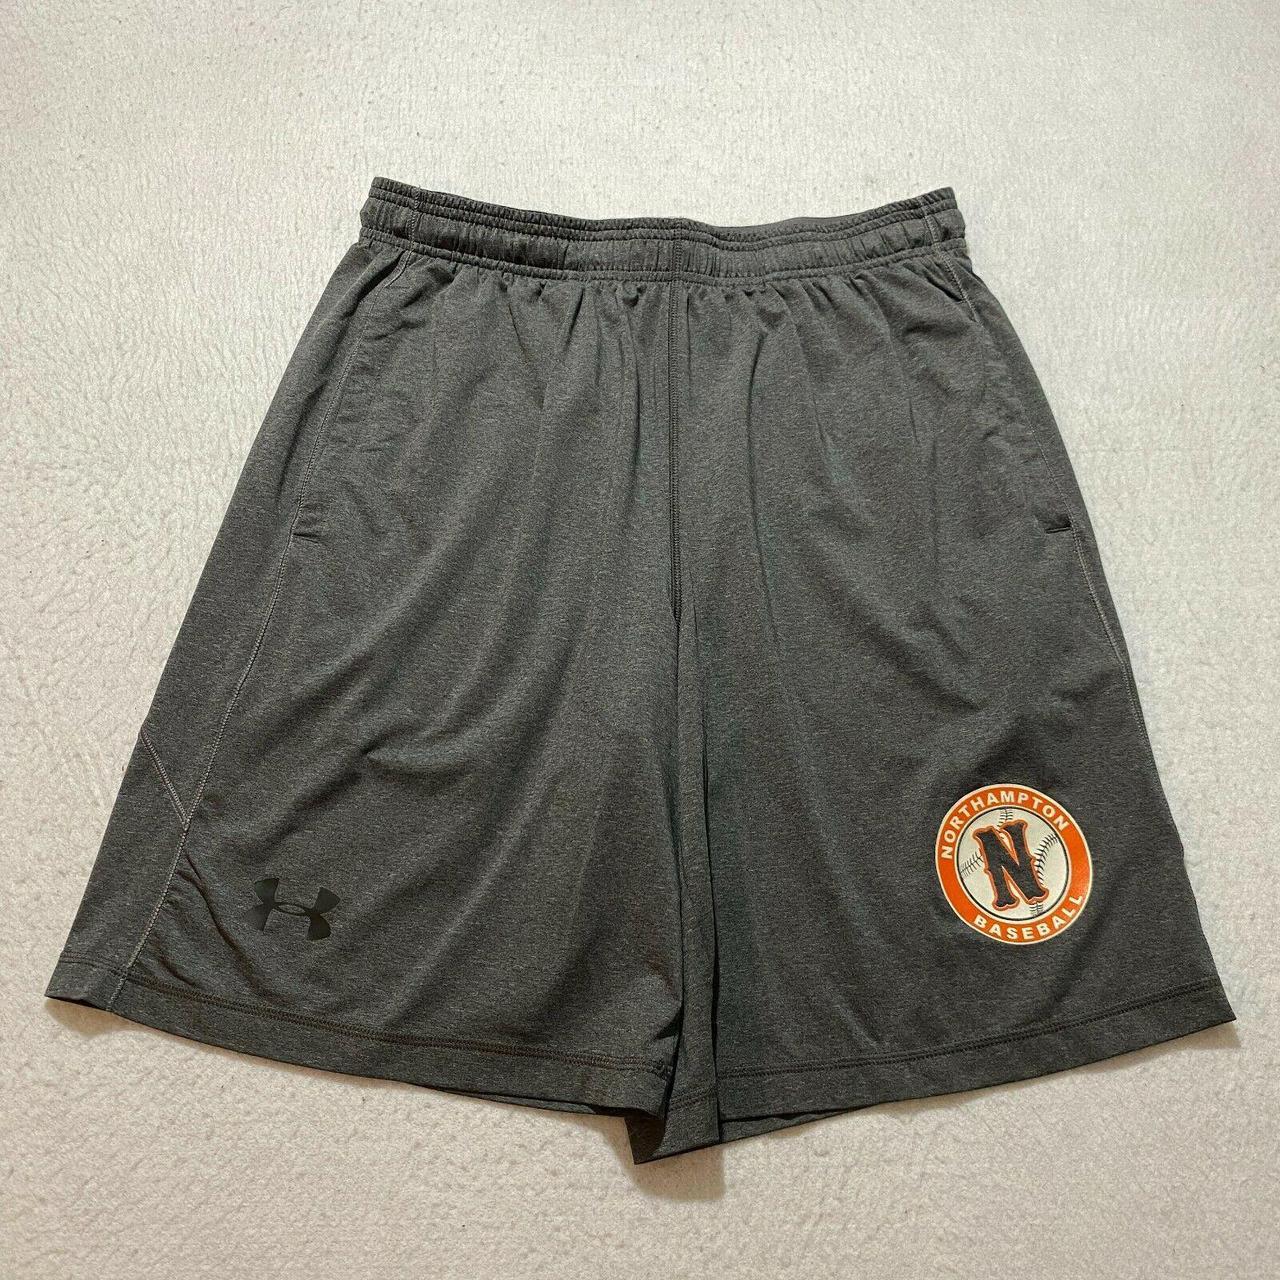 Product Image 1 - Under Armour Basketball Shorts Size